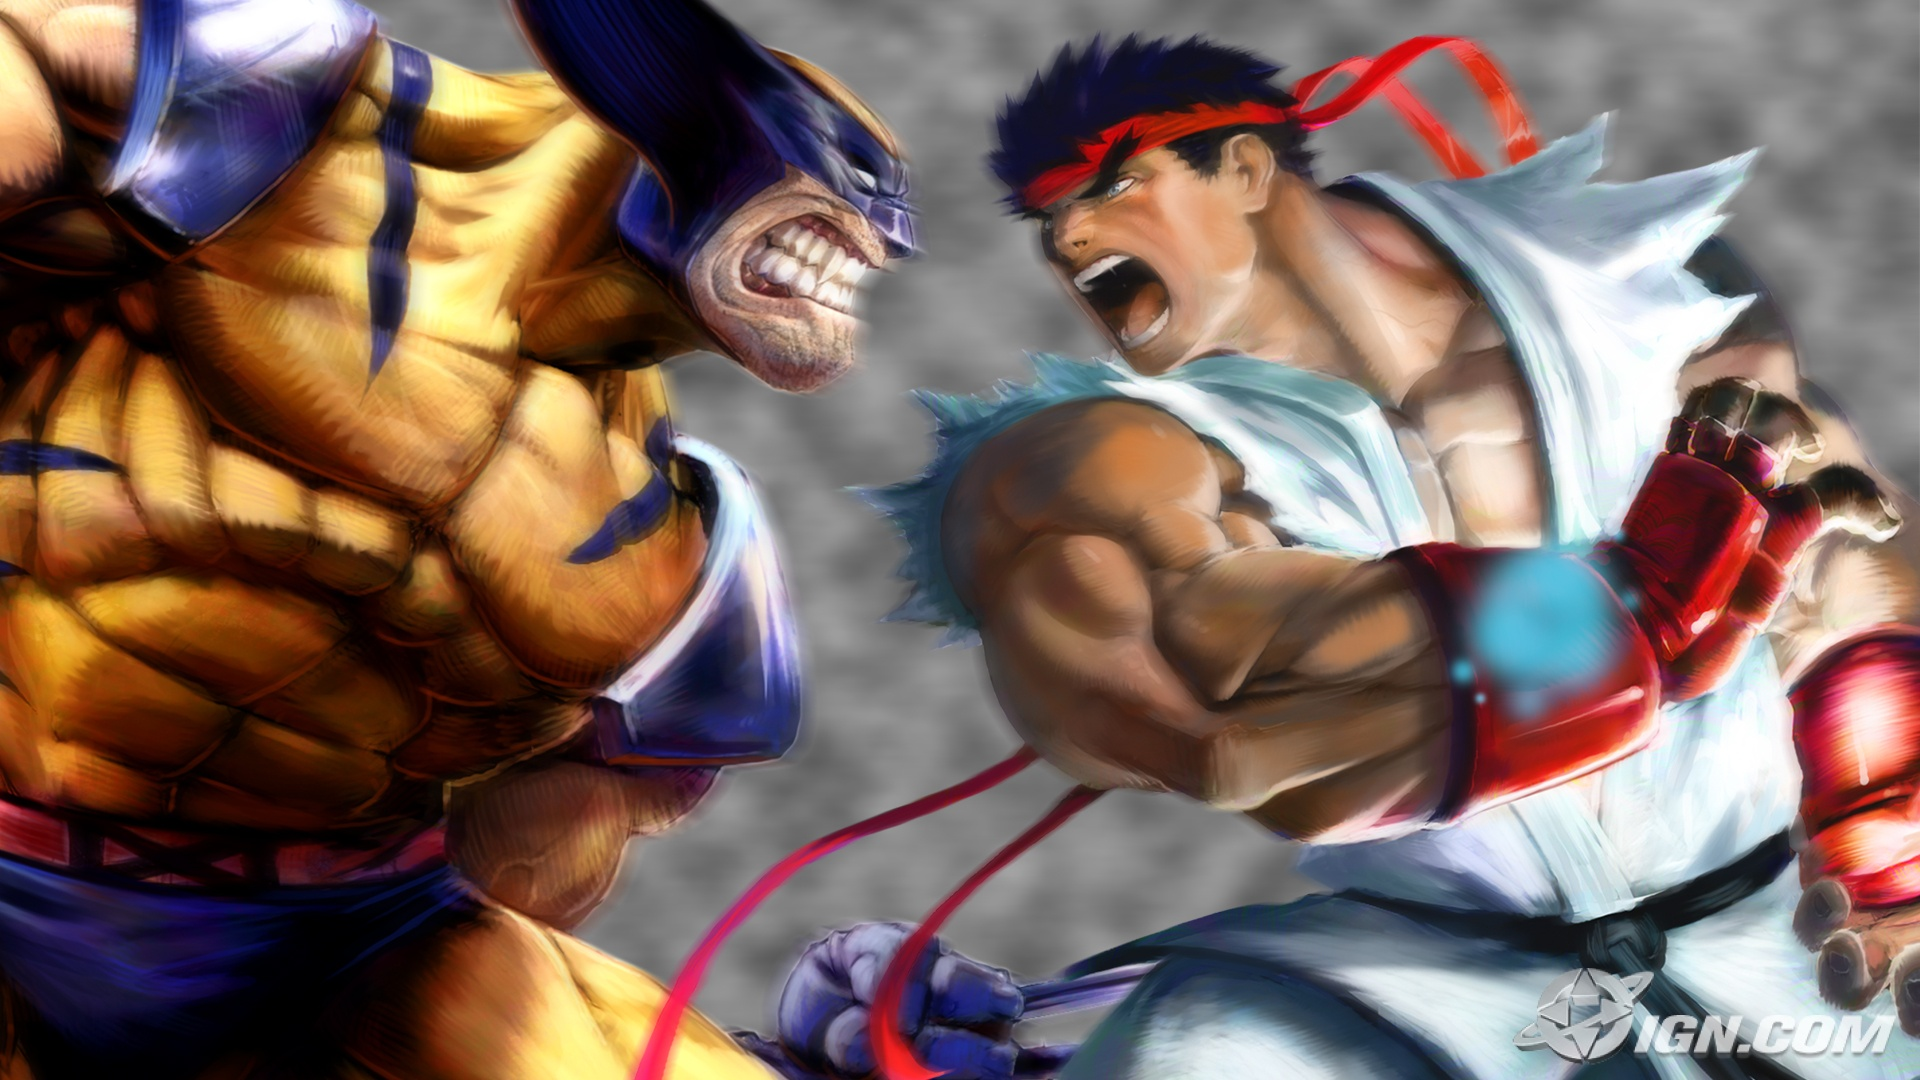 Marvel Vs Capcom 3 Gameplays [Yeah!]